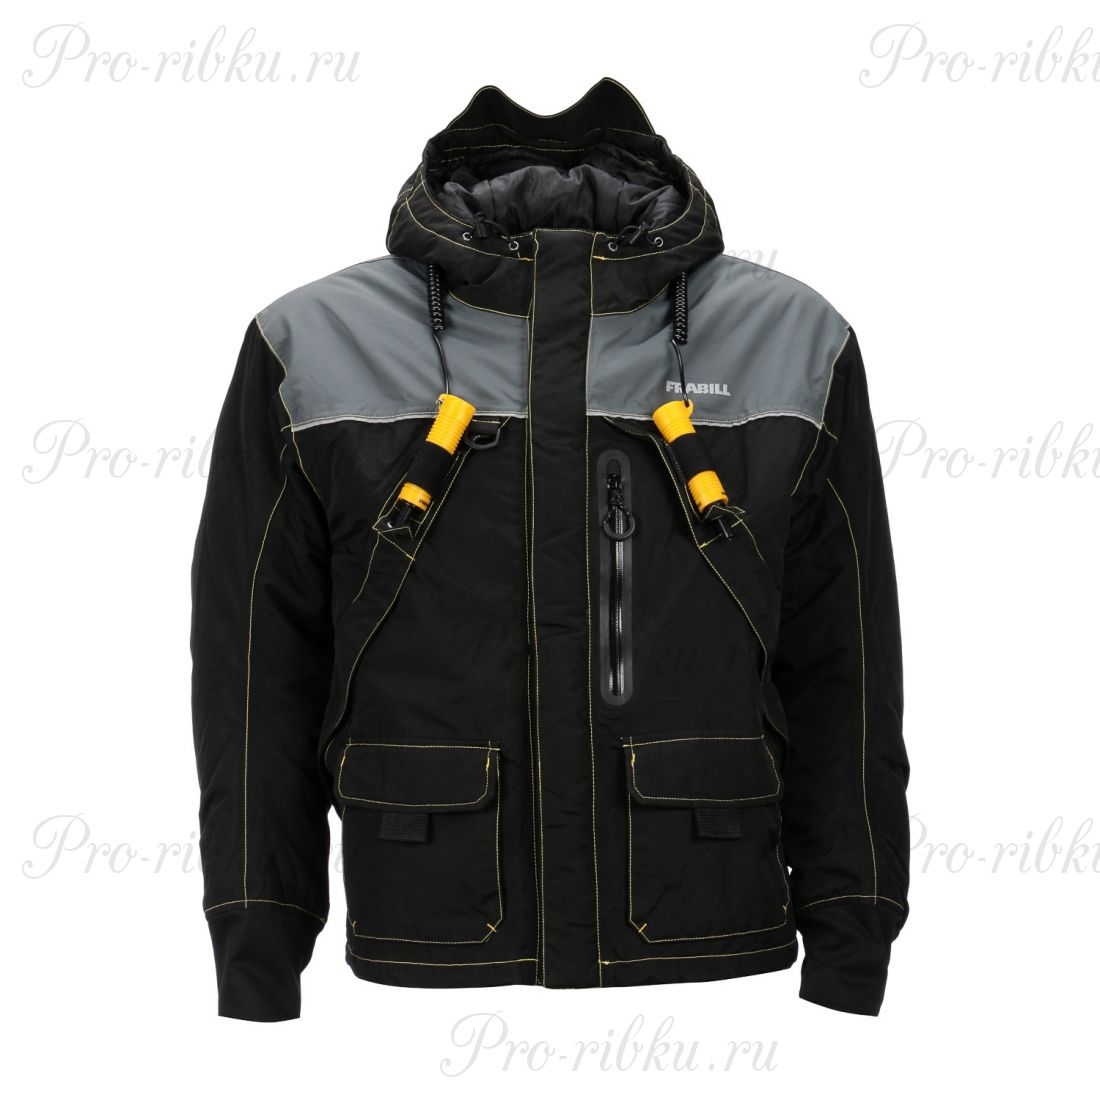 Куртка зимняя Frabill I3 Jacket, Black размер M